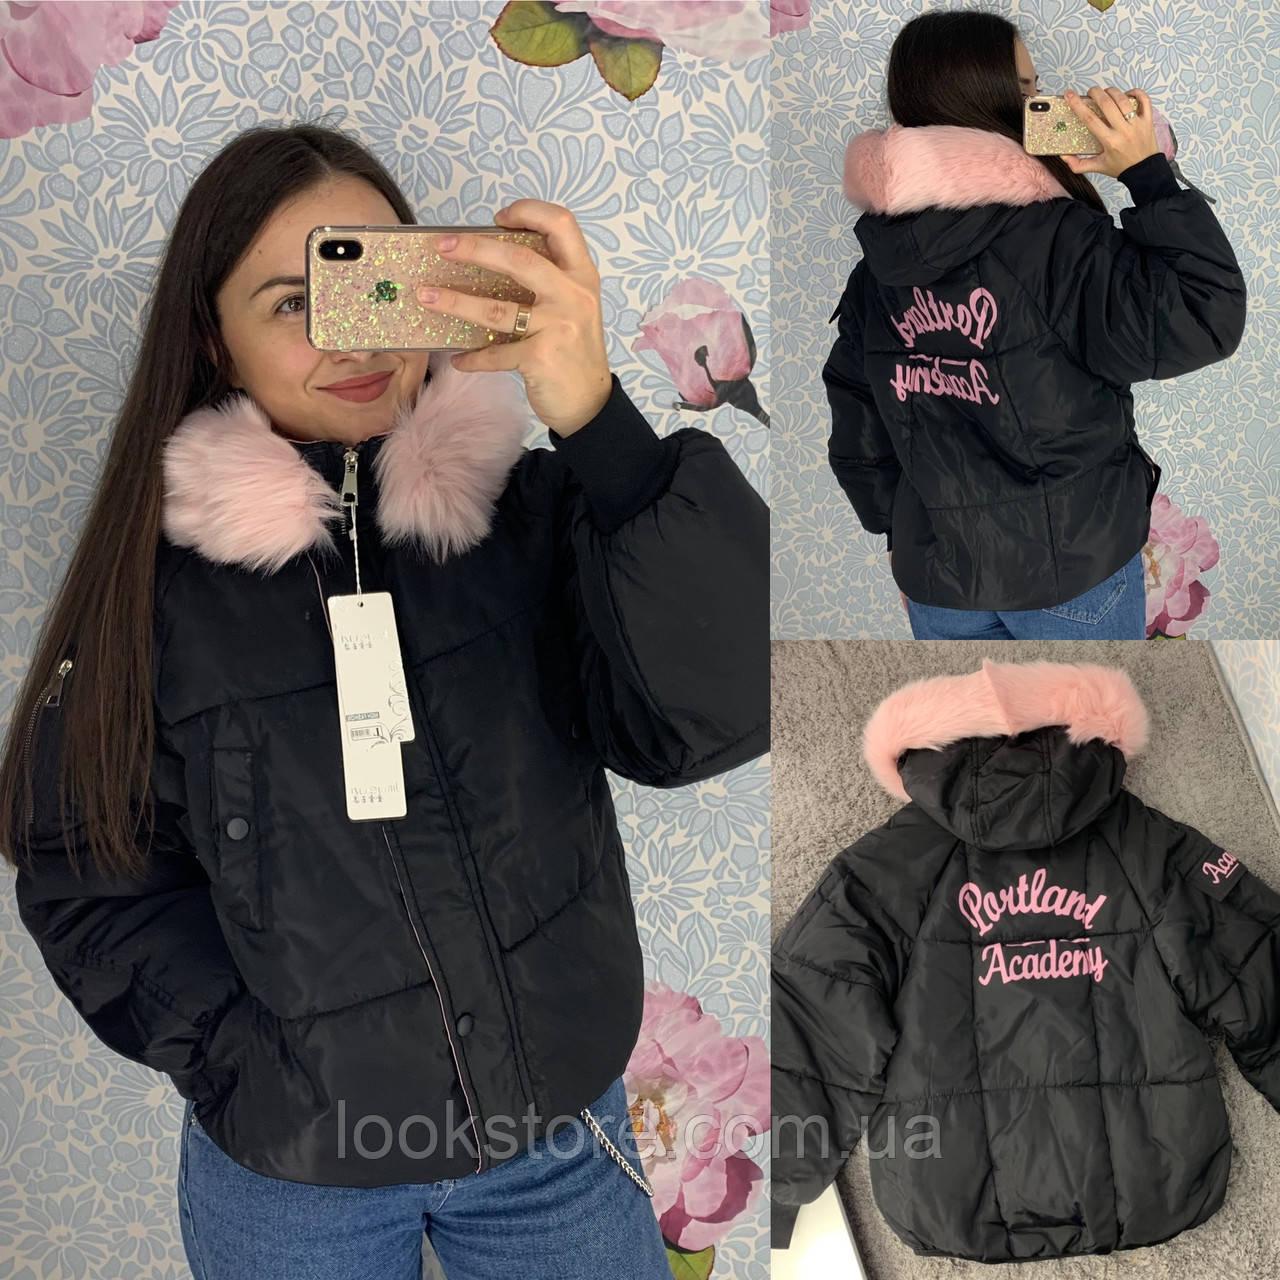 Жіноча коротка куртка парку Portland Academy чорна